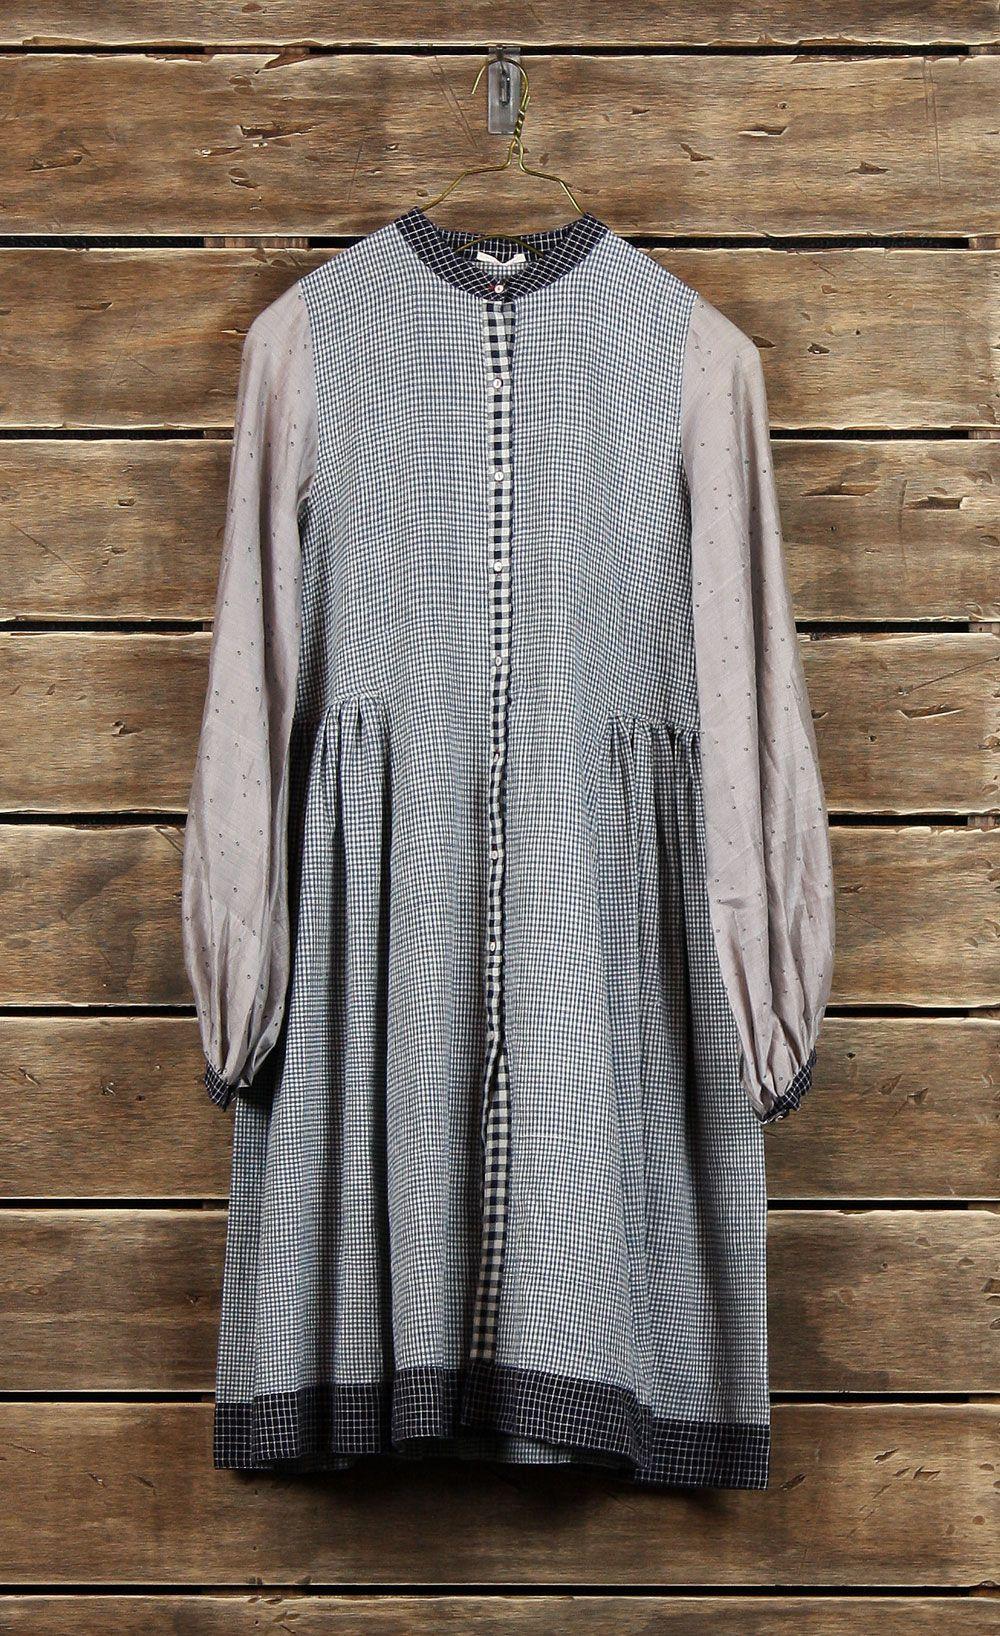 Sooti dress by injiri uinjiriu a colloquial pronunciation of the